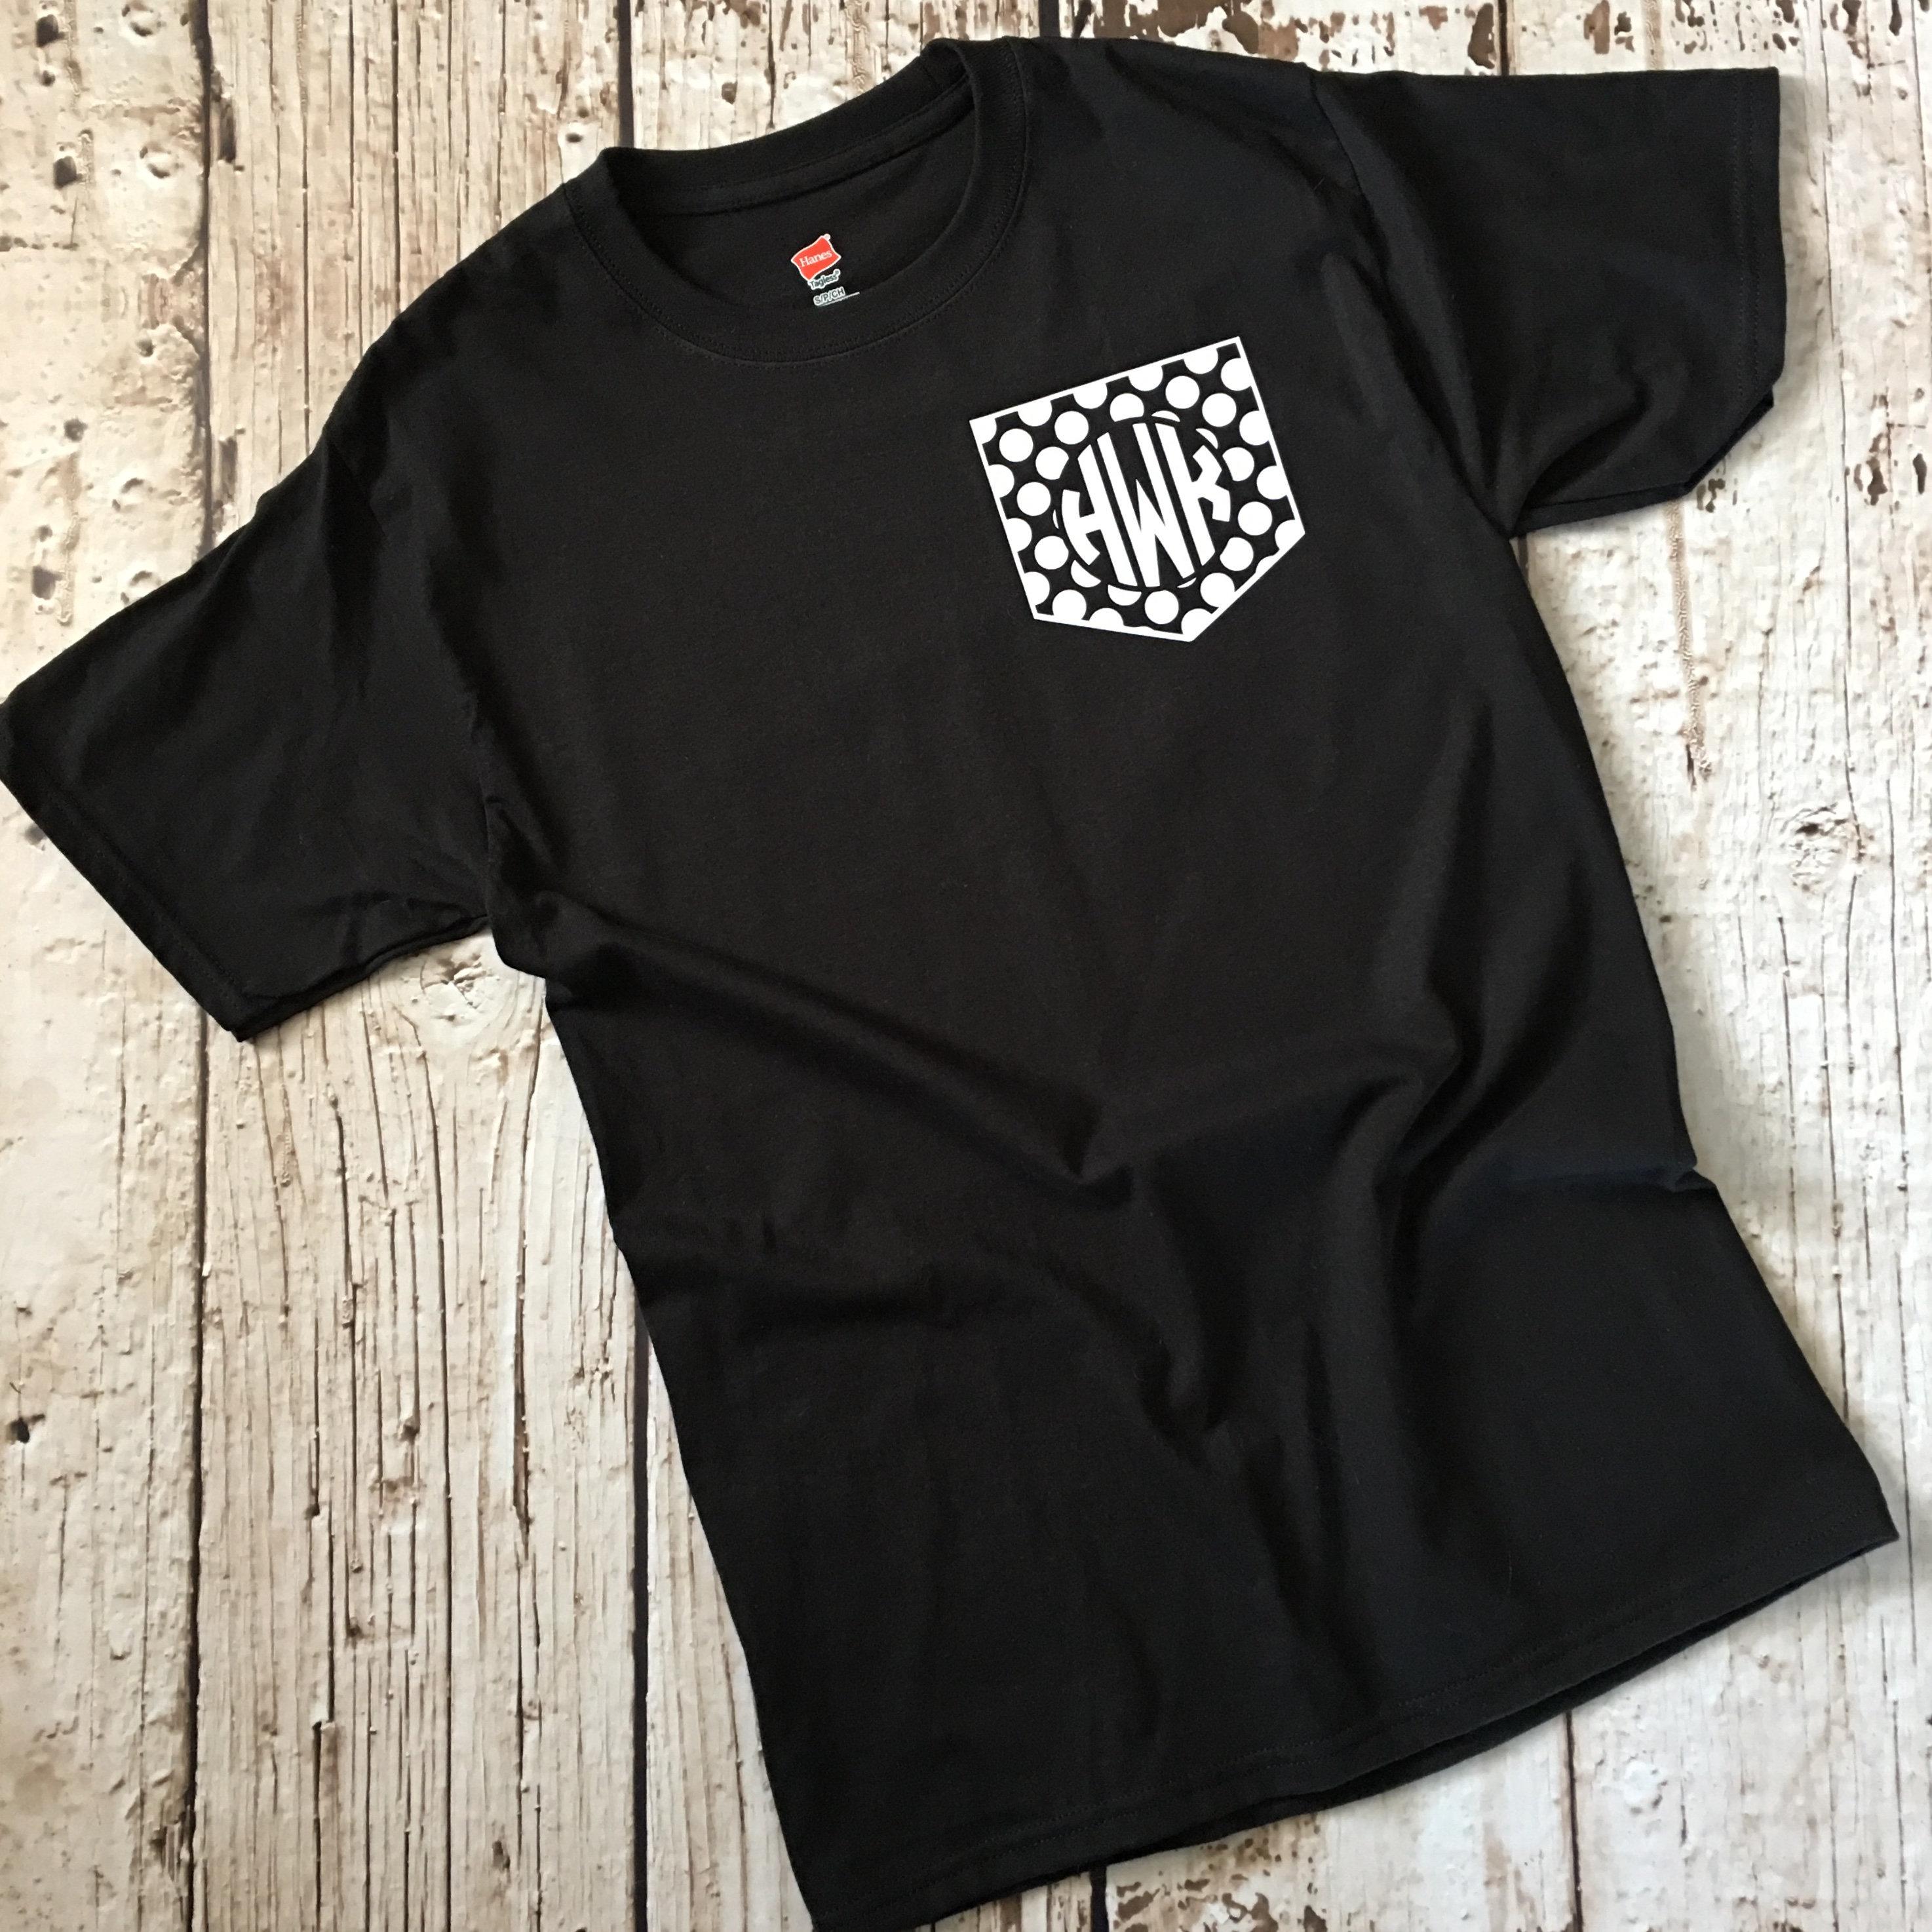 Work Shirts Personalized